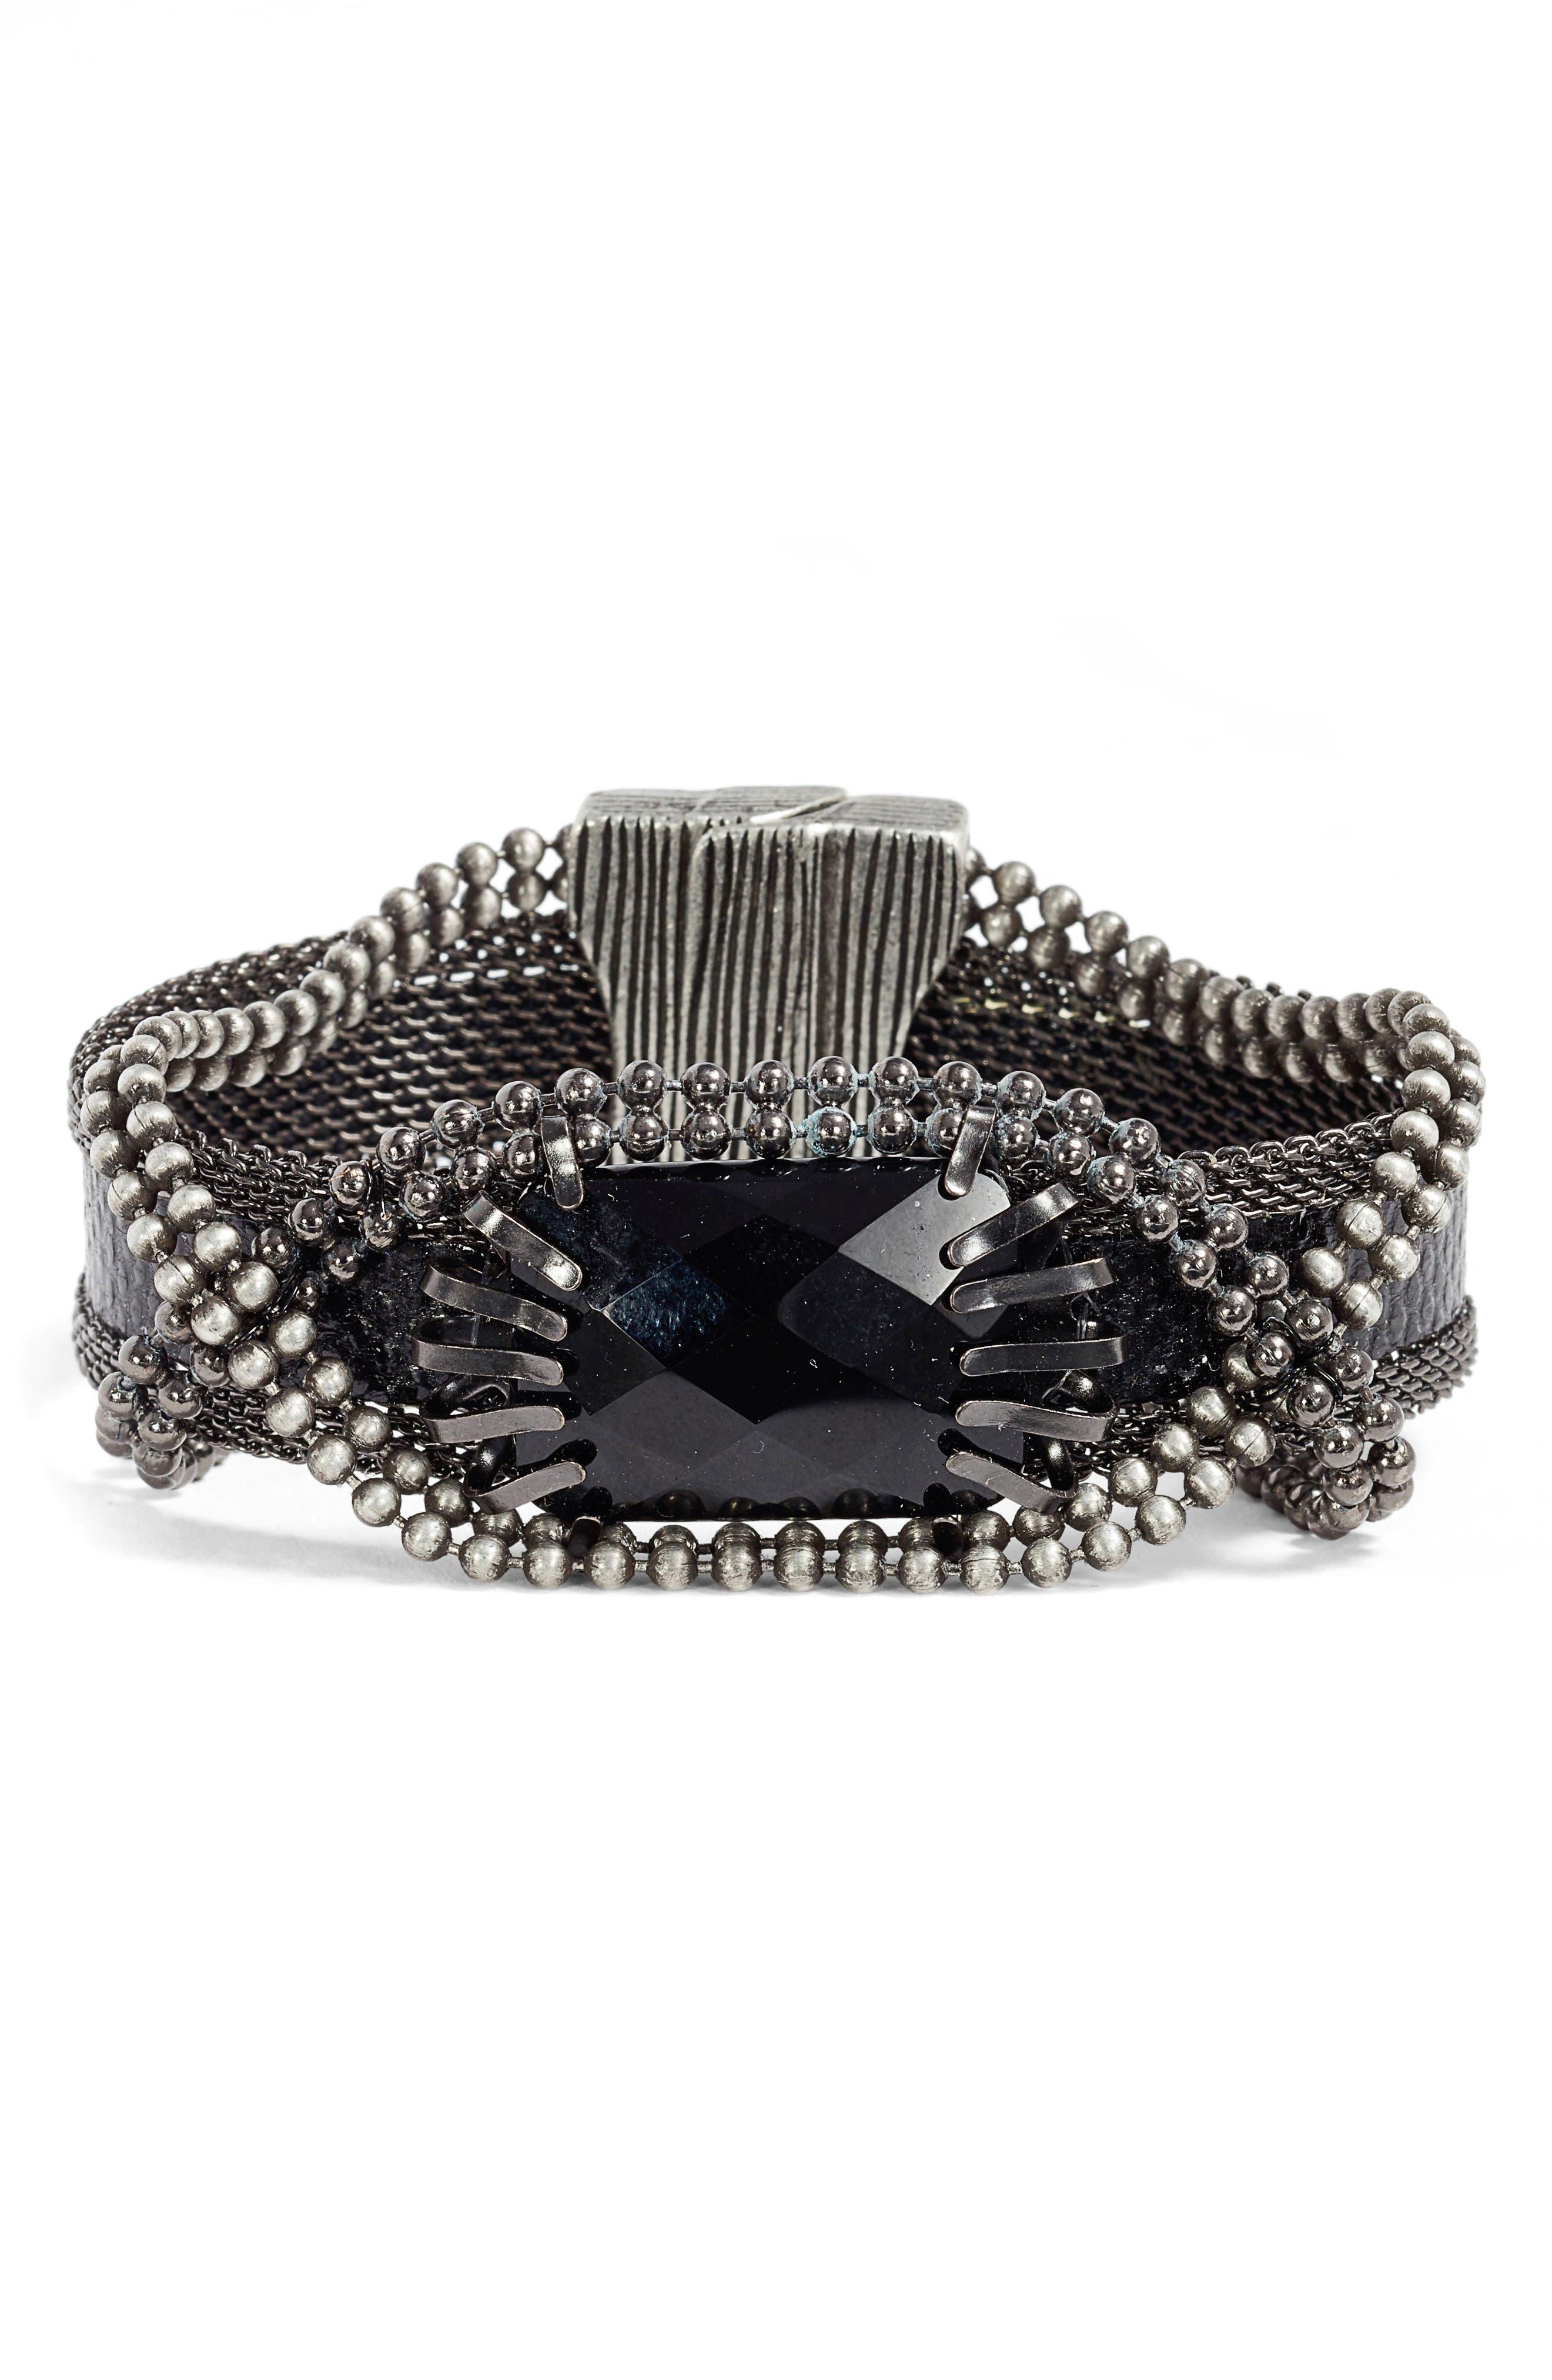 Stone & Snakeskin Bracelet,                             Main thumbnail 1, color,                             BLACK/ GUNMETAL